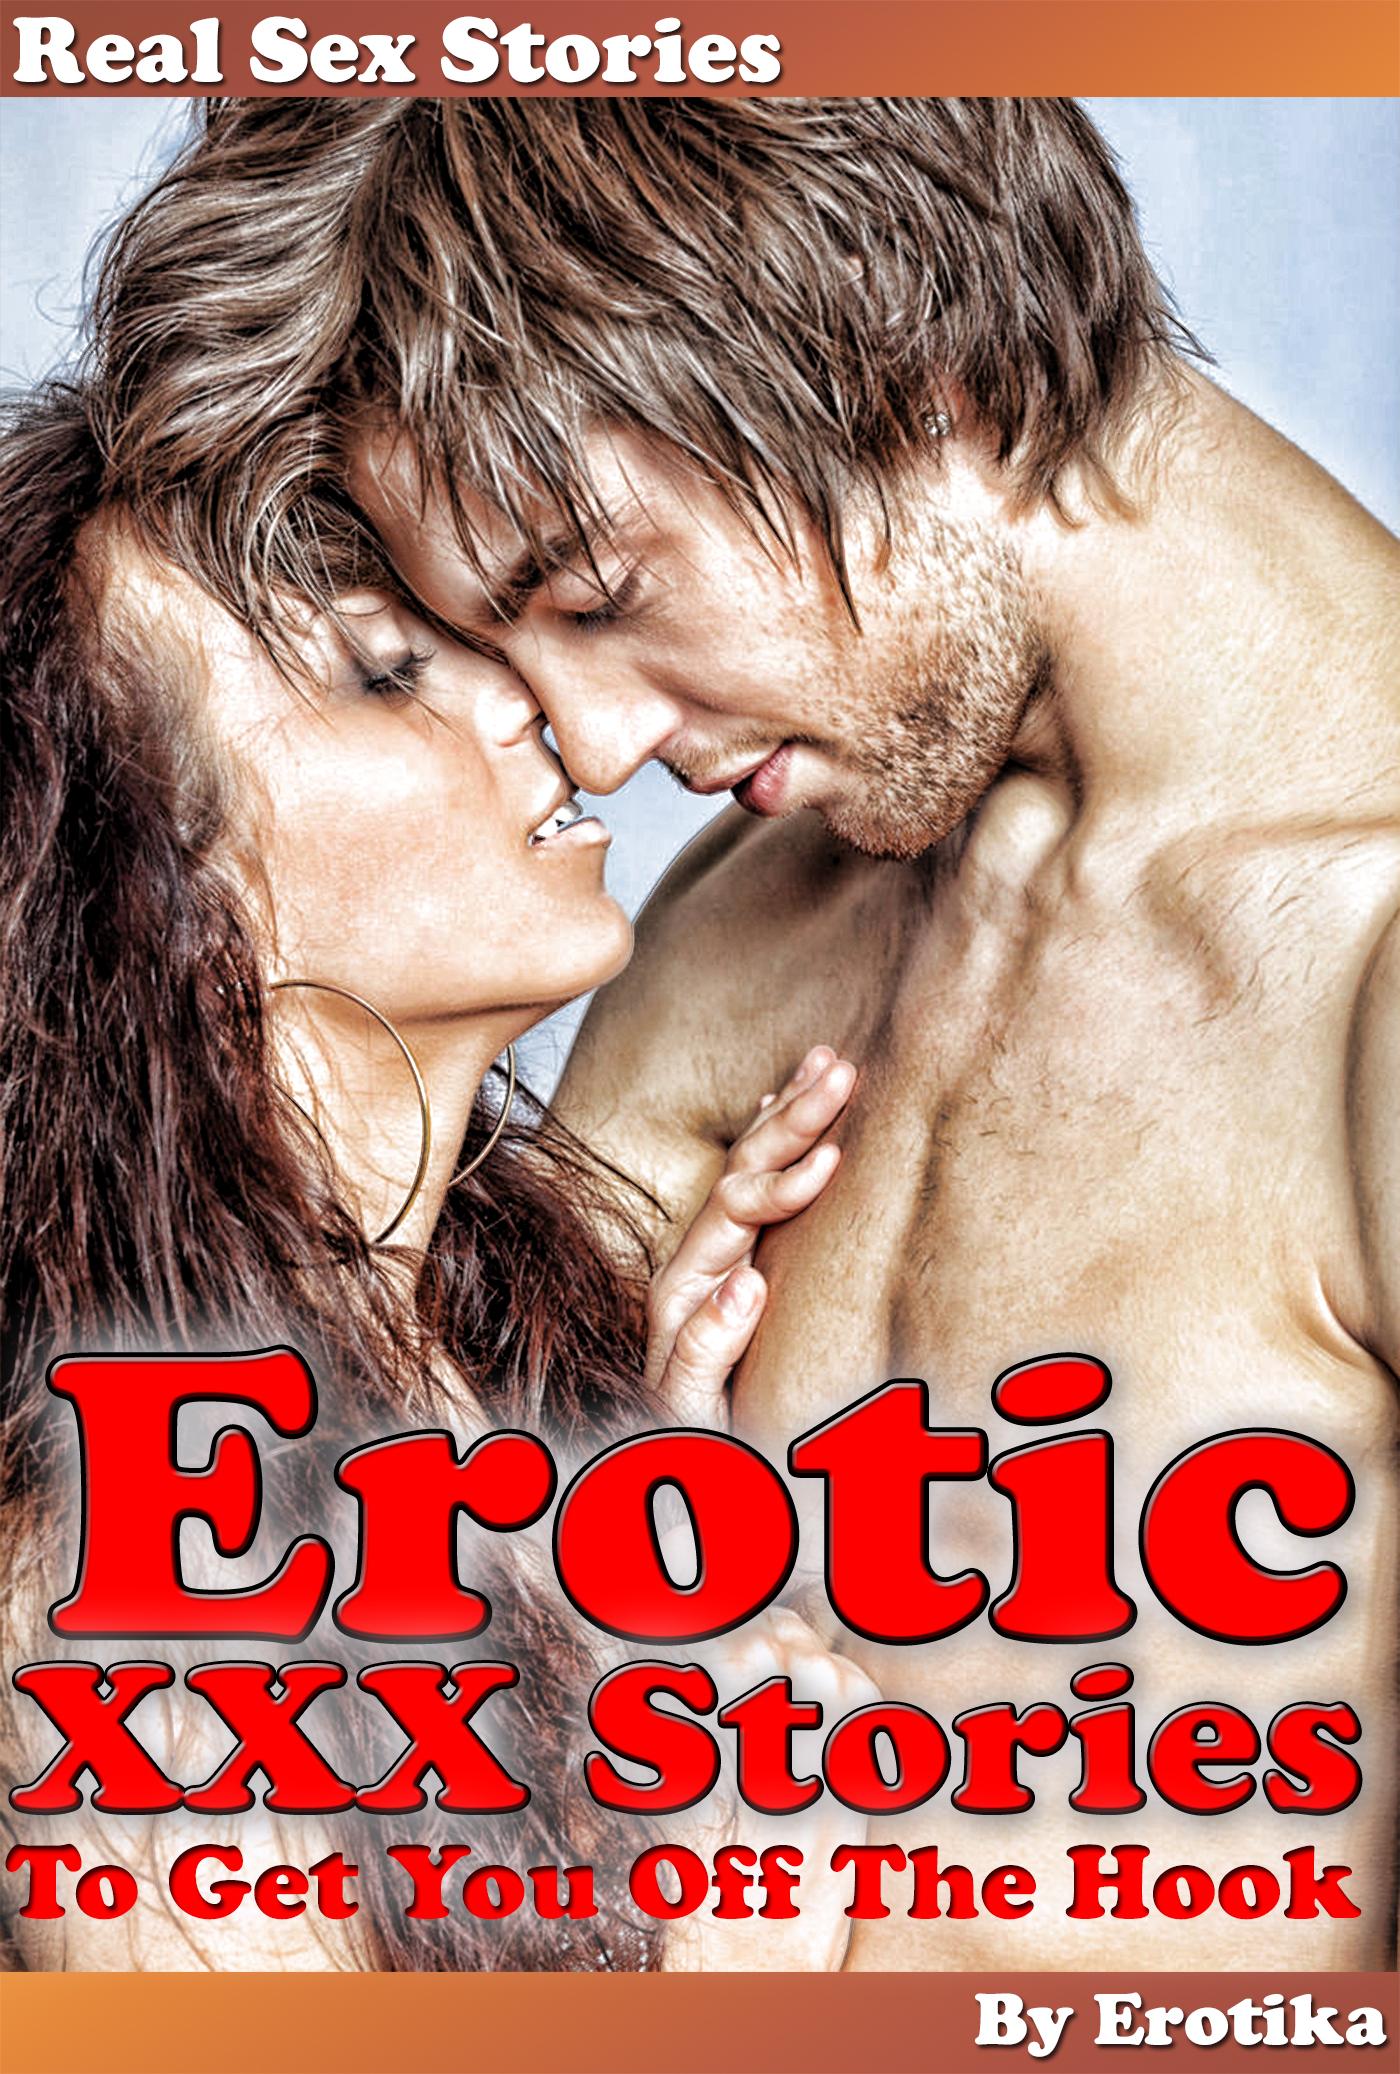 Real Sex Stories Erotic